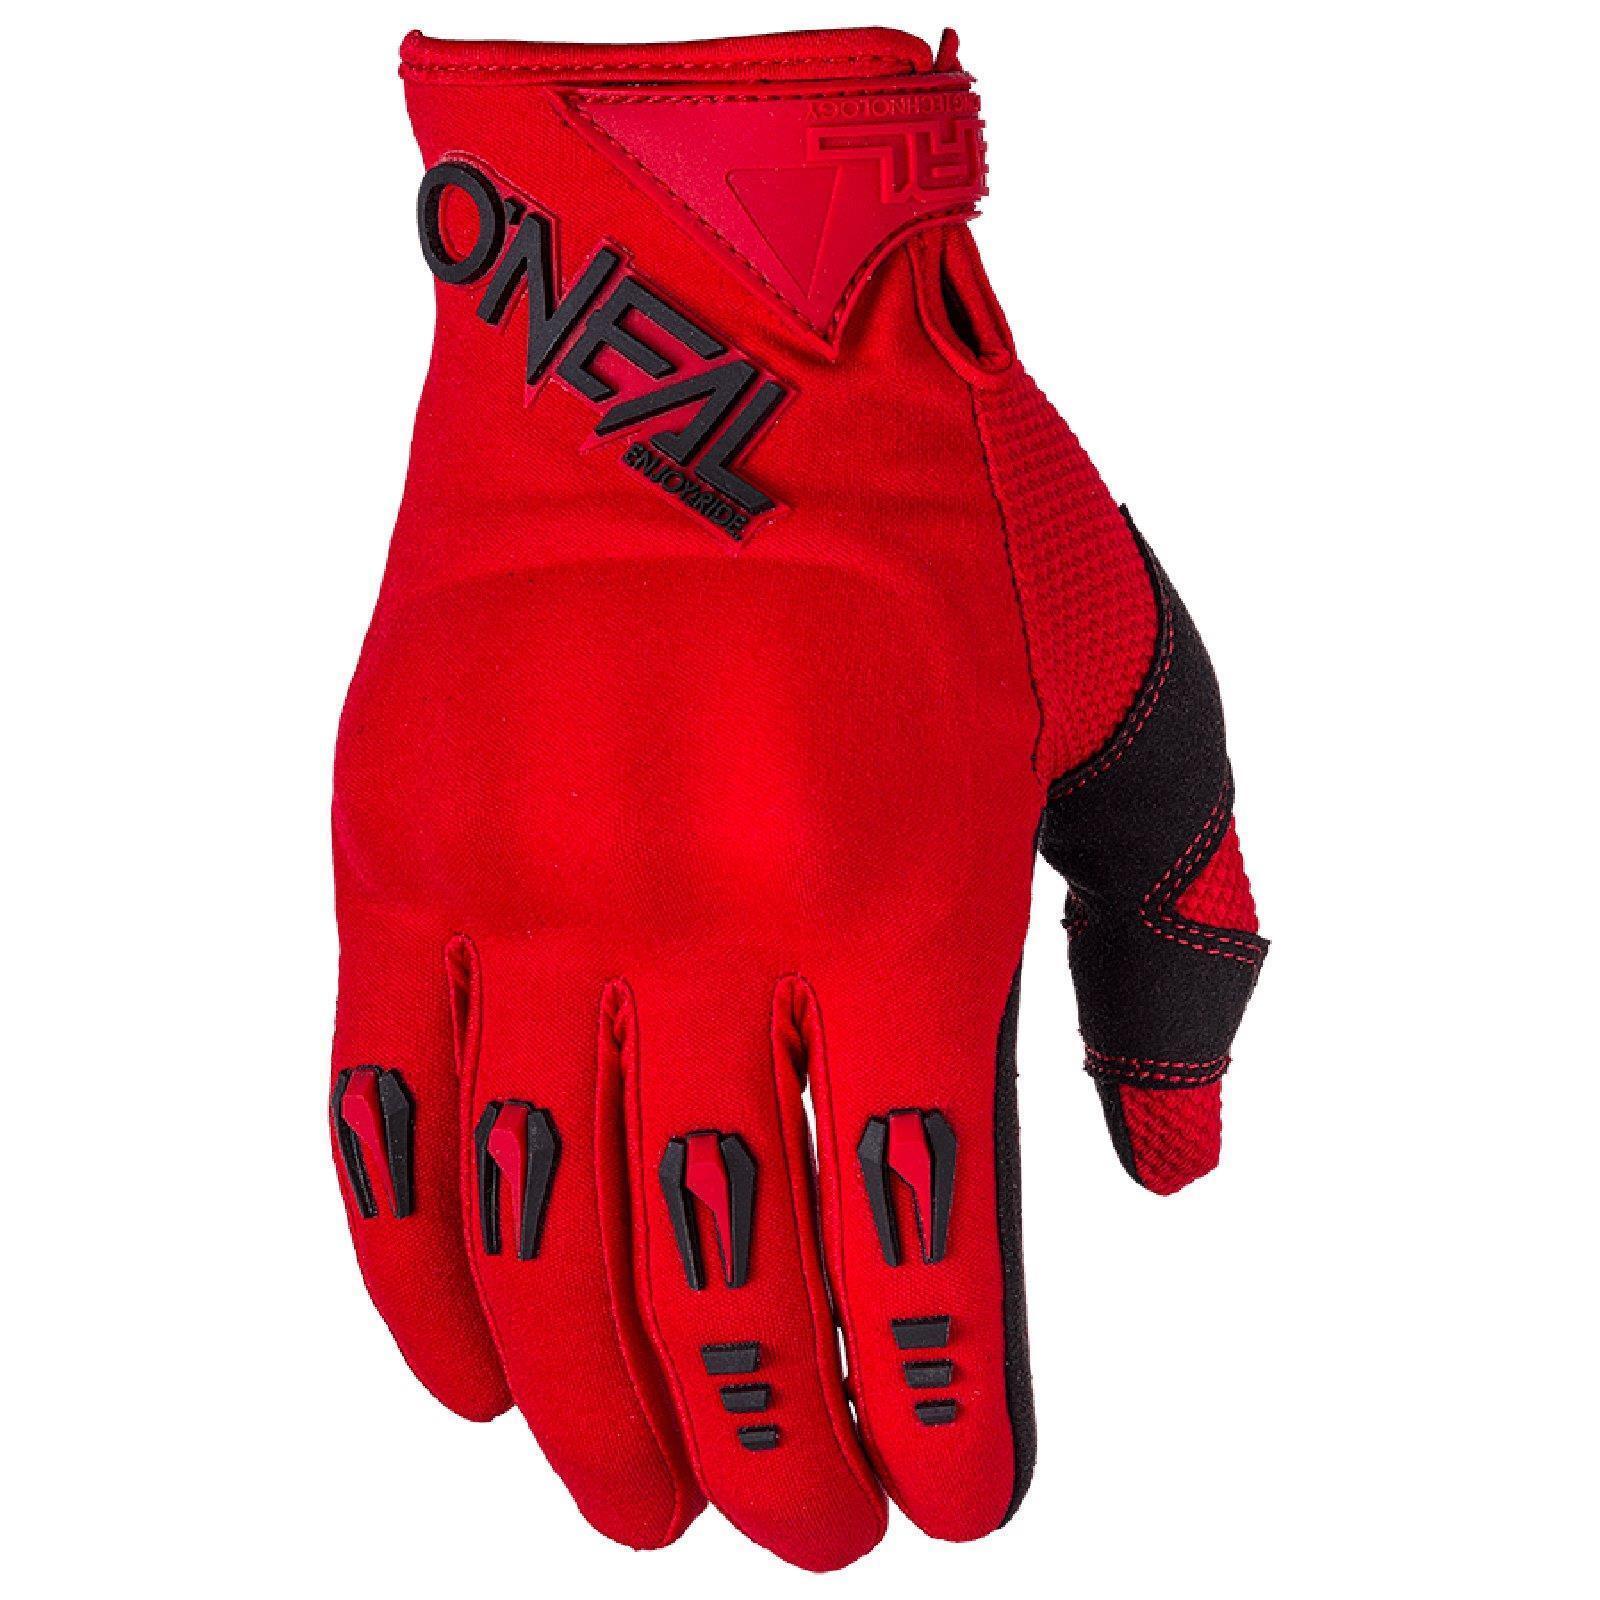 ONEAL Hardwear IRON MX Guanti Guanti Guanti MOTO CROSS ENDURO DH DOWNHILL MOTO estremamente 6408b1